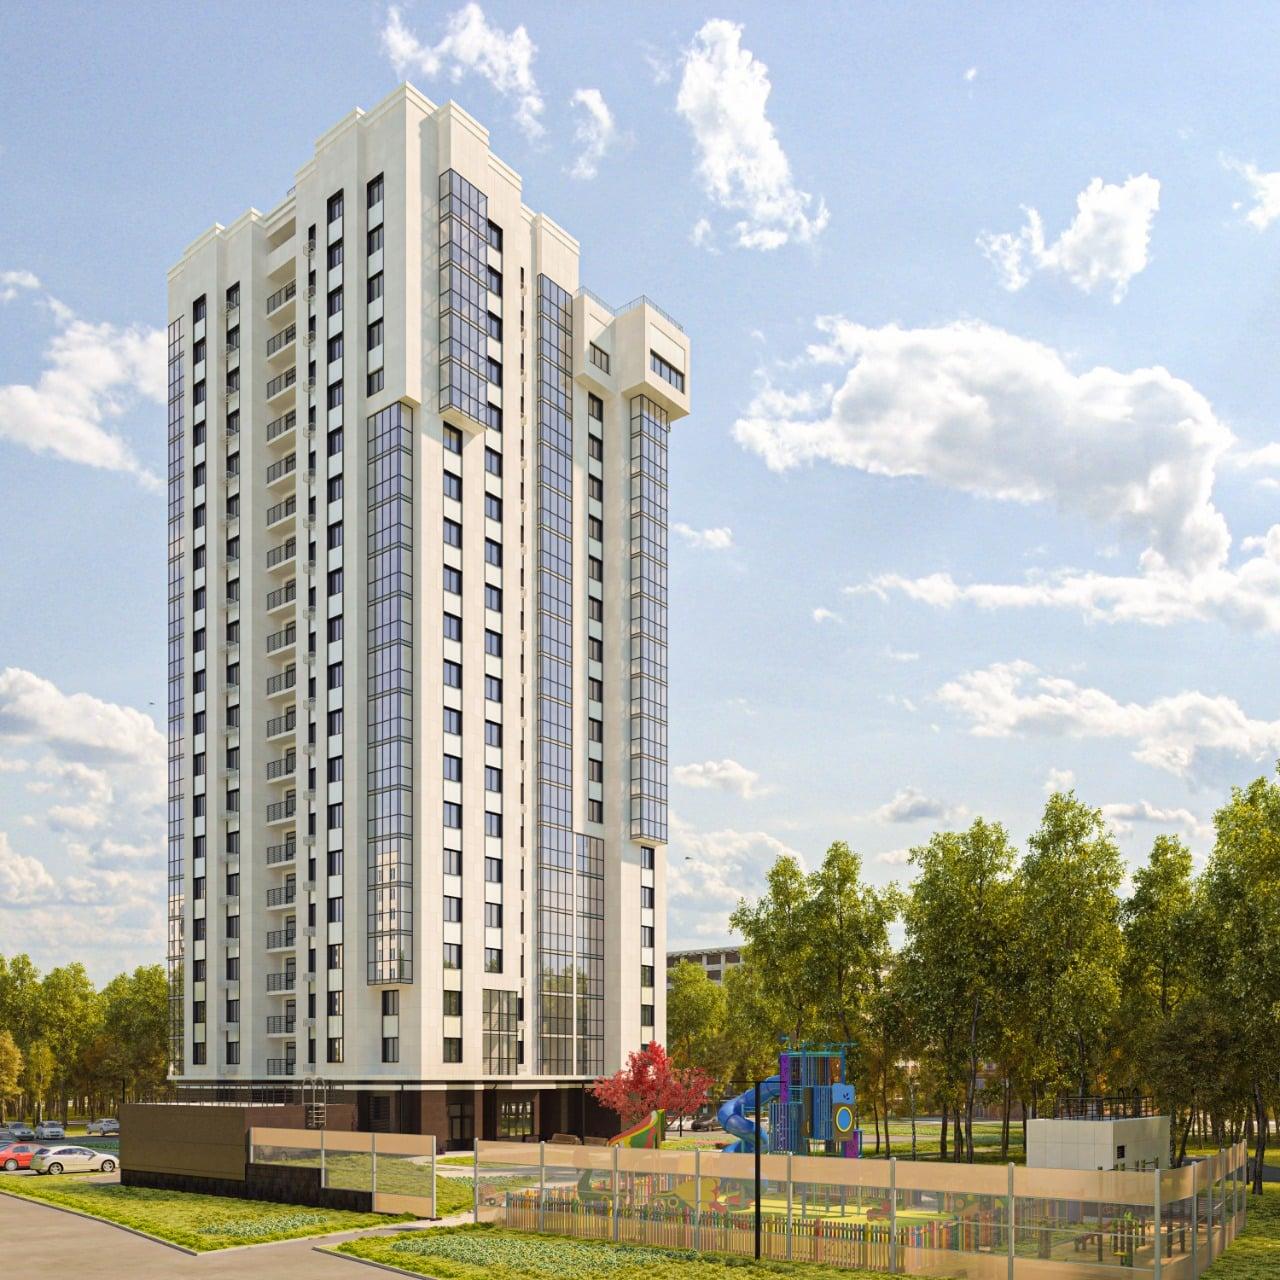 Дом на 131 квартиру по реновации введут в районе Лианозово в 2022 году